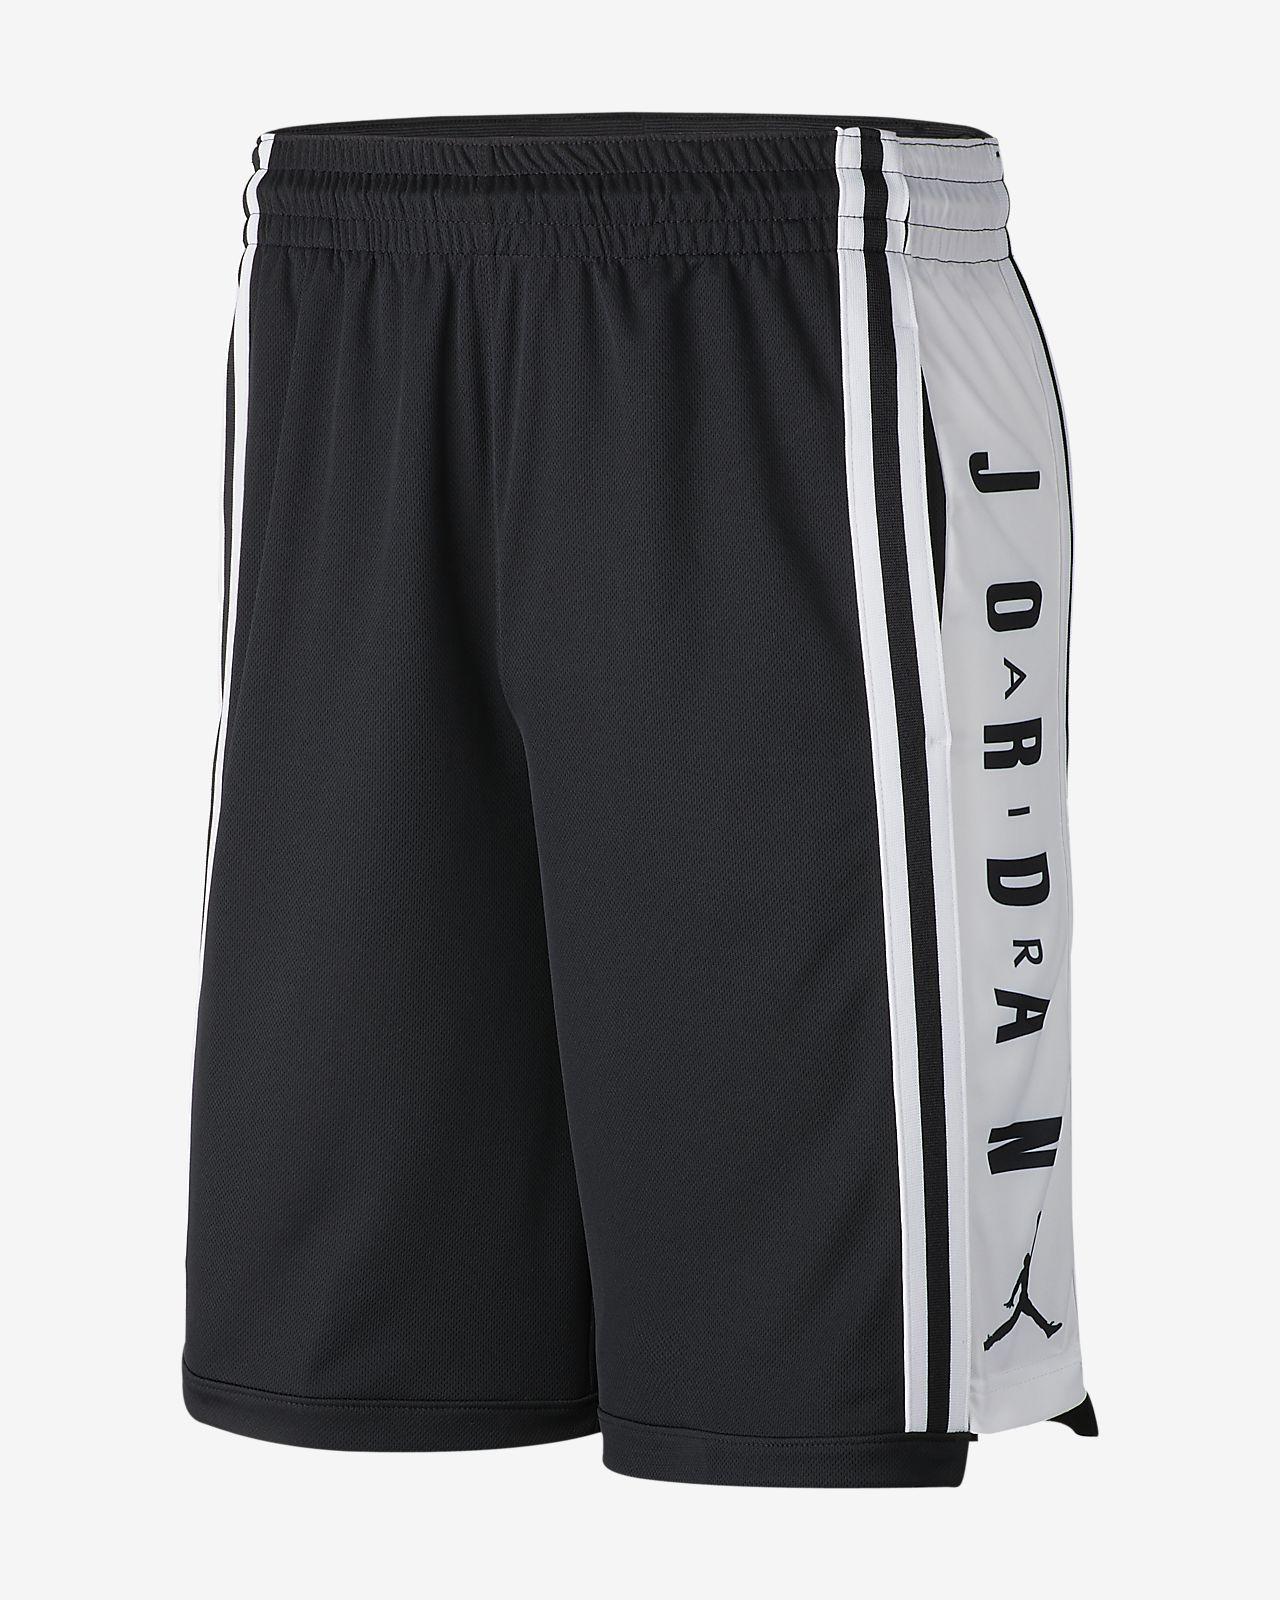 Pánské basketbalové kraťasy Jordan